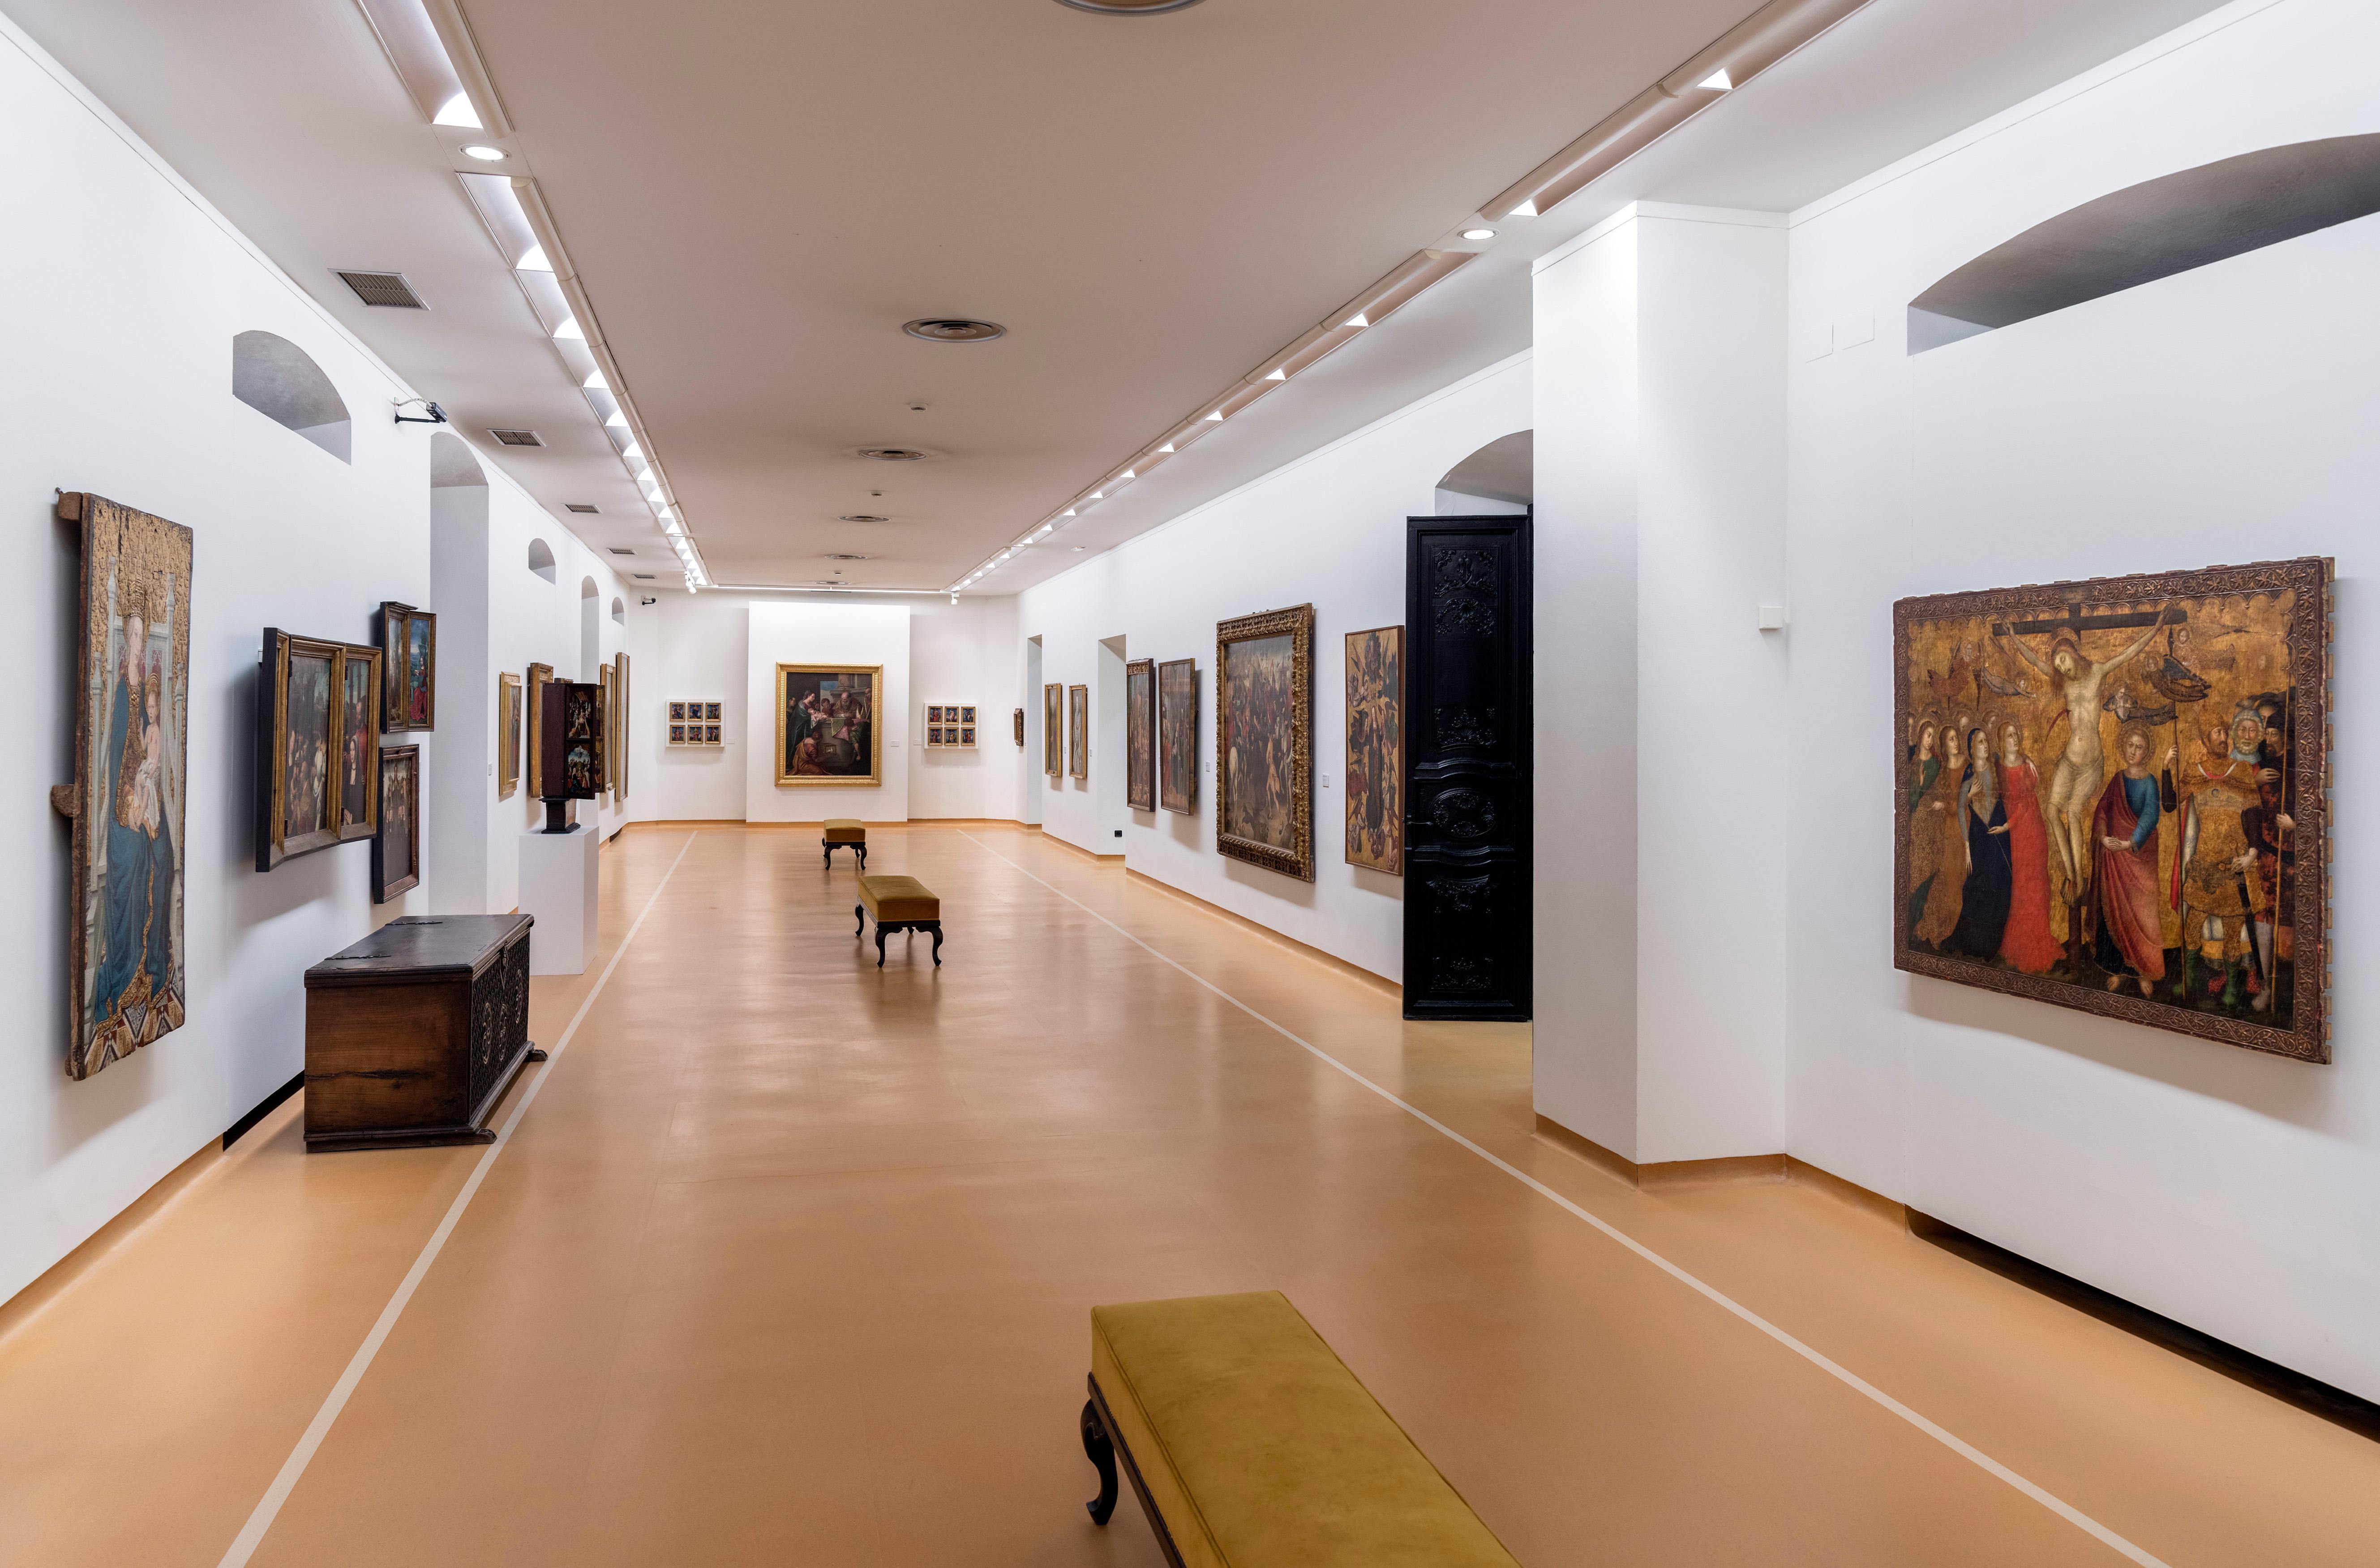 Interior of the Museo de Bellas Artes (Fine Arts Museum), Oviedo, Asturias, Spain